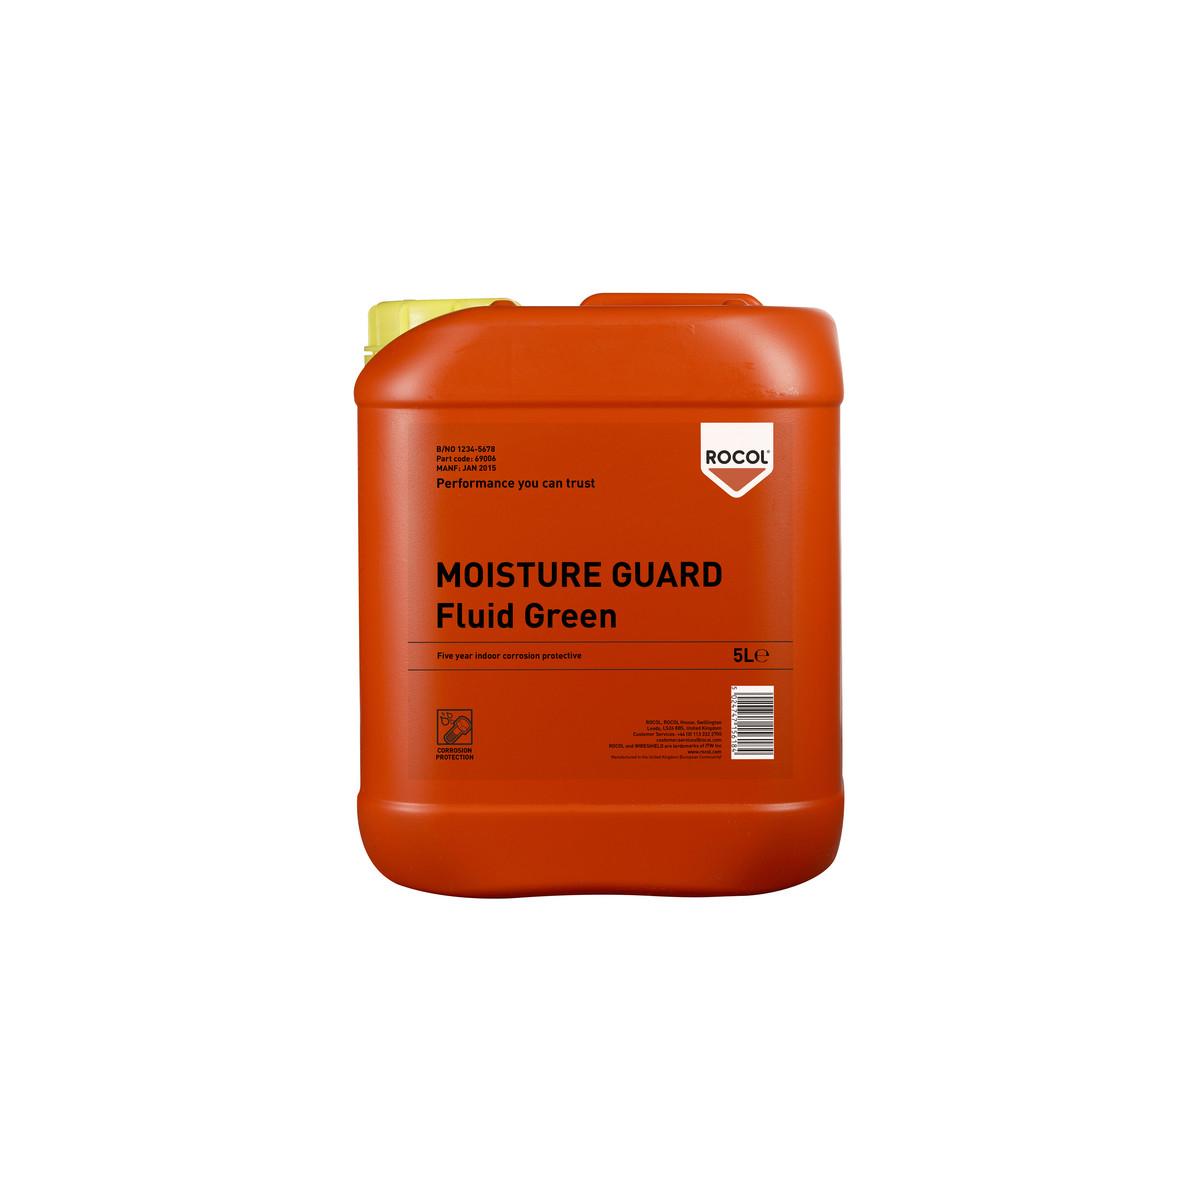 MOISTURE GUARD FLUIDO - 5L